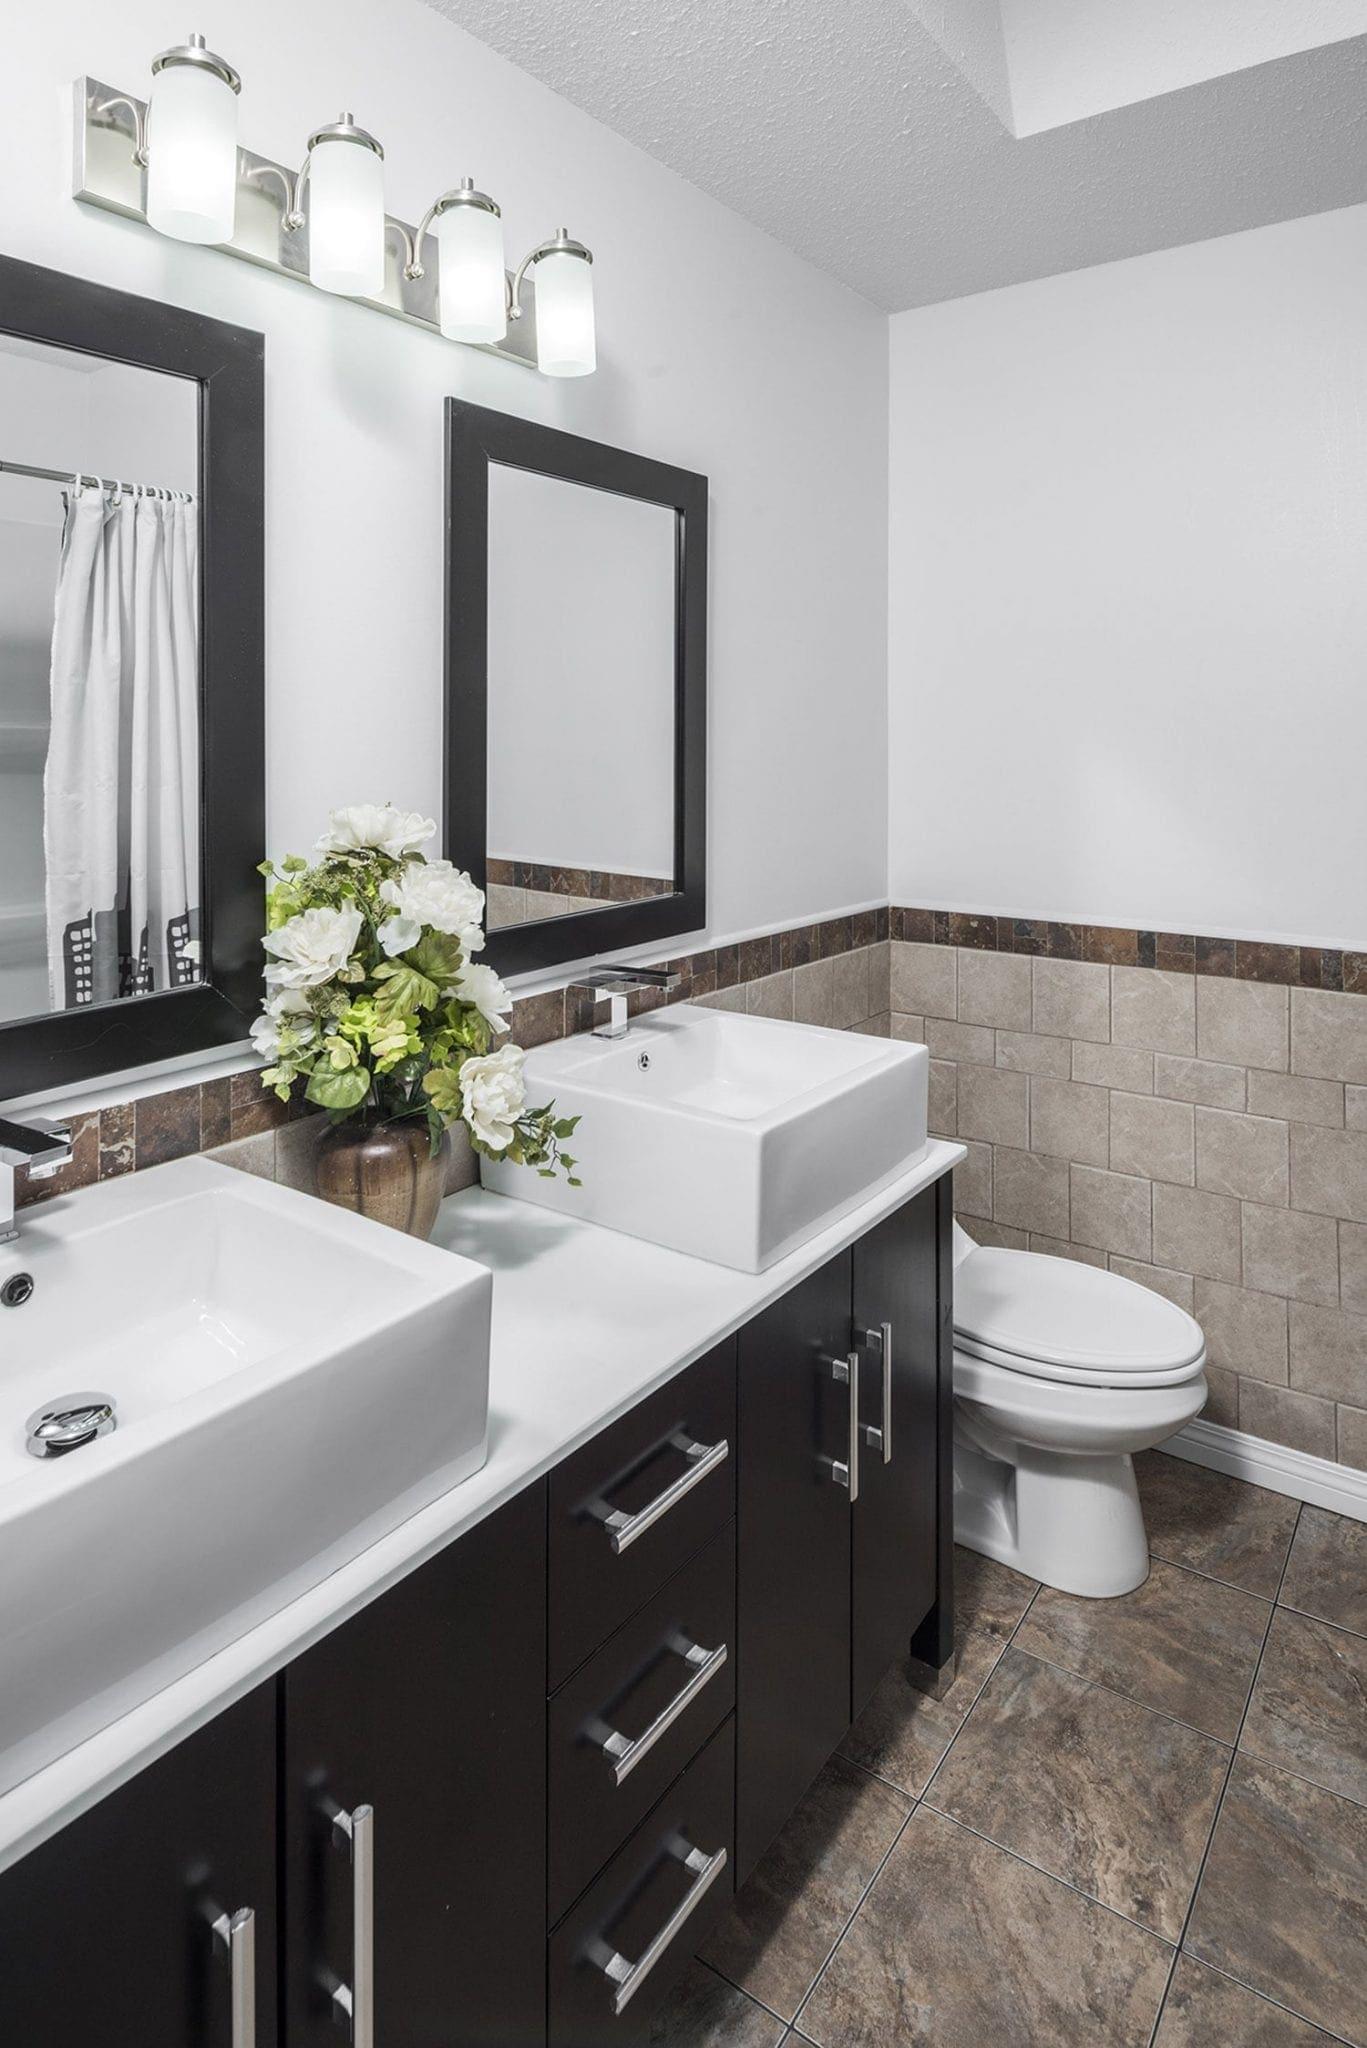 Chilliwack Bathroom Renovation Contractor Master Painting & Renovations Abbotsford